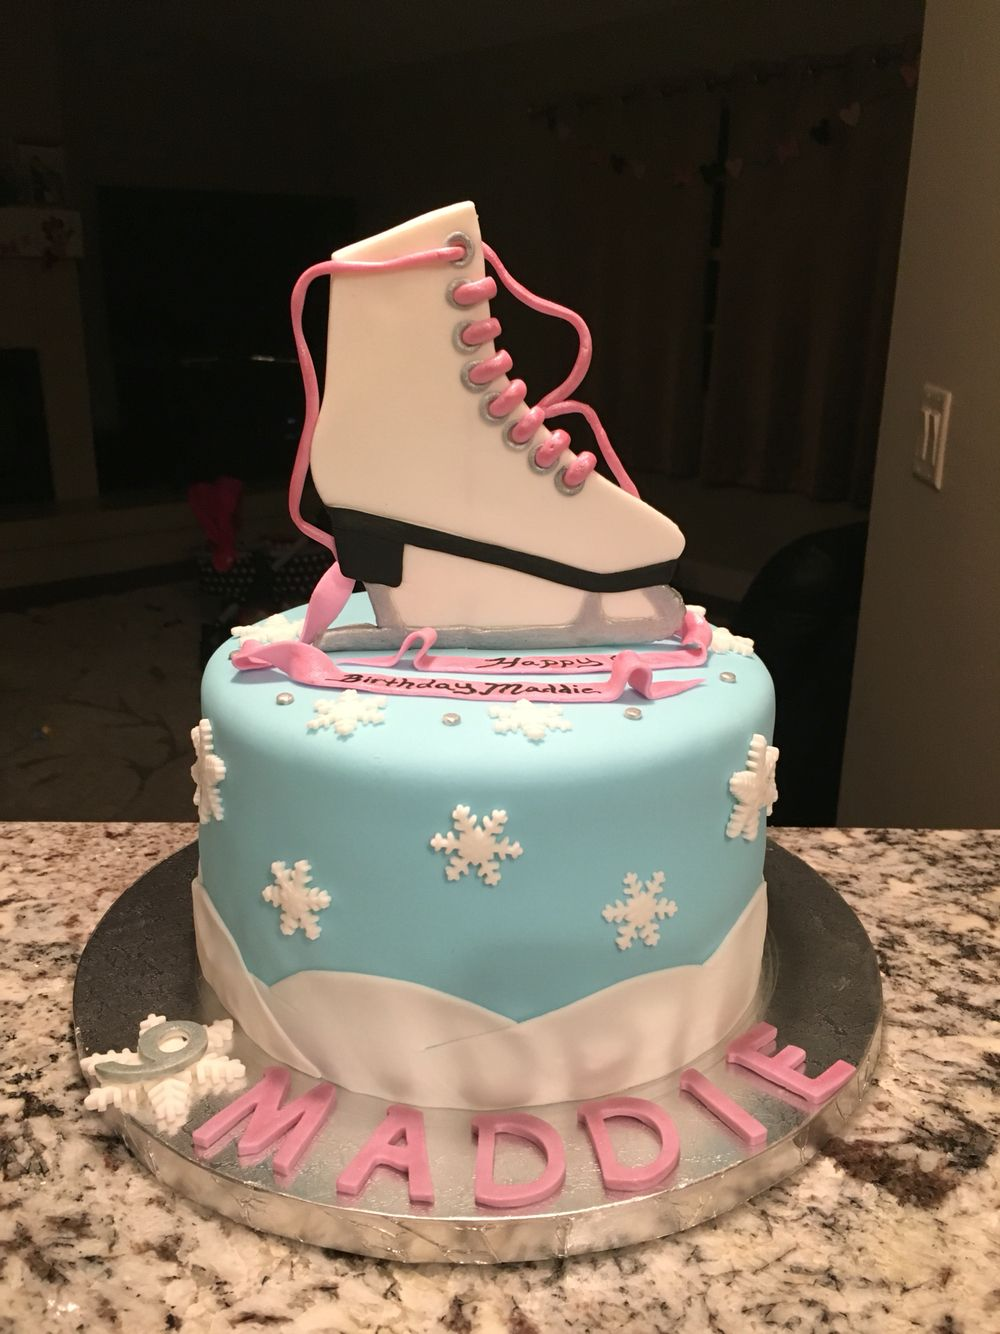 Custom Ice Skate Cake With Images Ice Skating Cake Skate